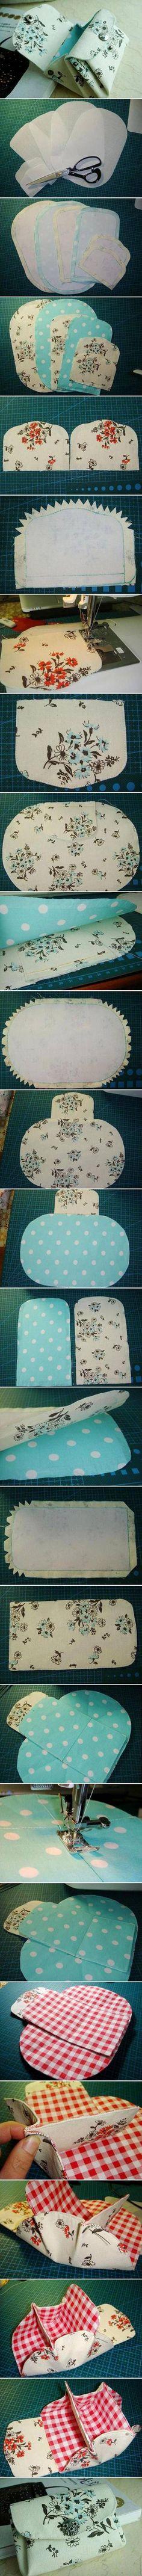 DIY Fabric Folding Purse: